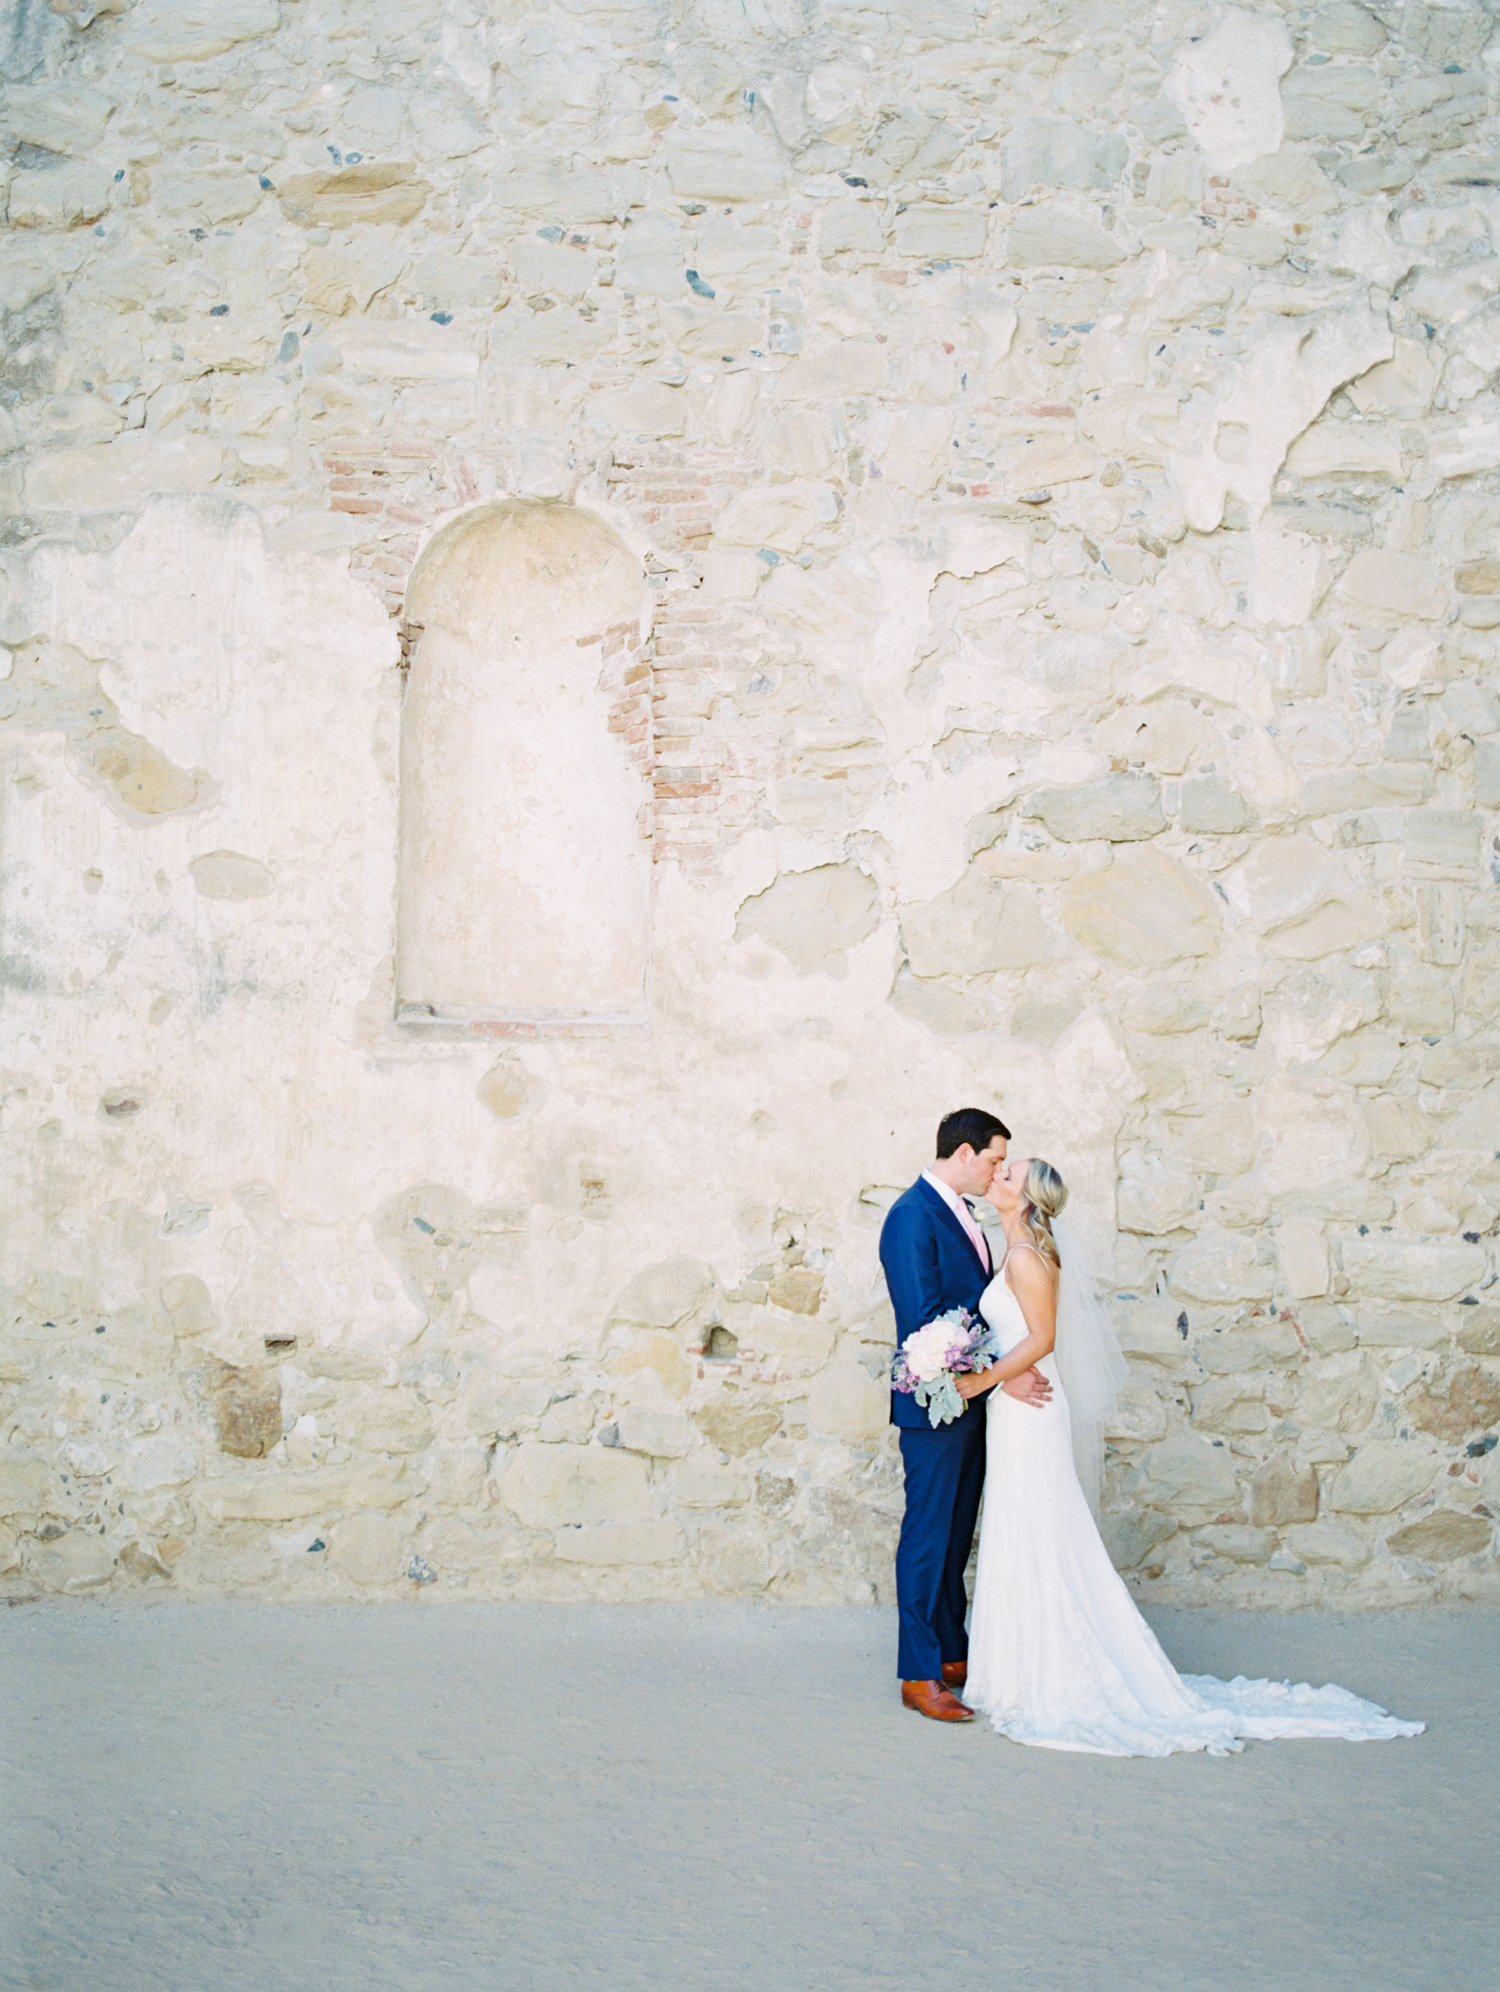 057-Jen-Wojcik-Photography-San-Diego-Wedding-Photographer.jpg